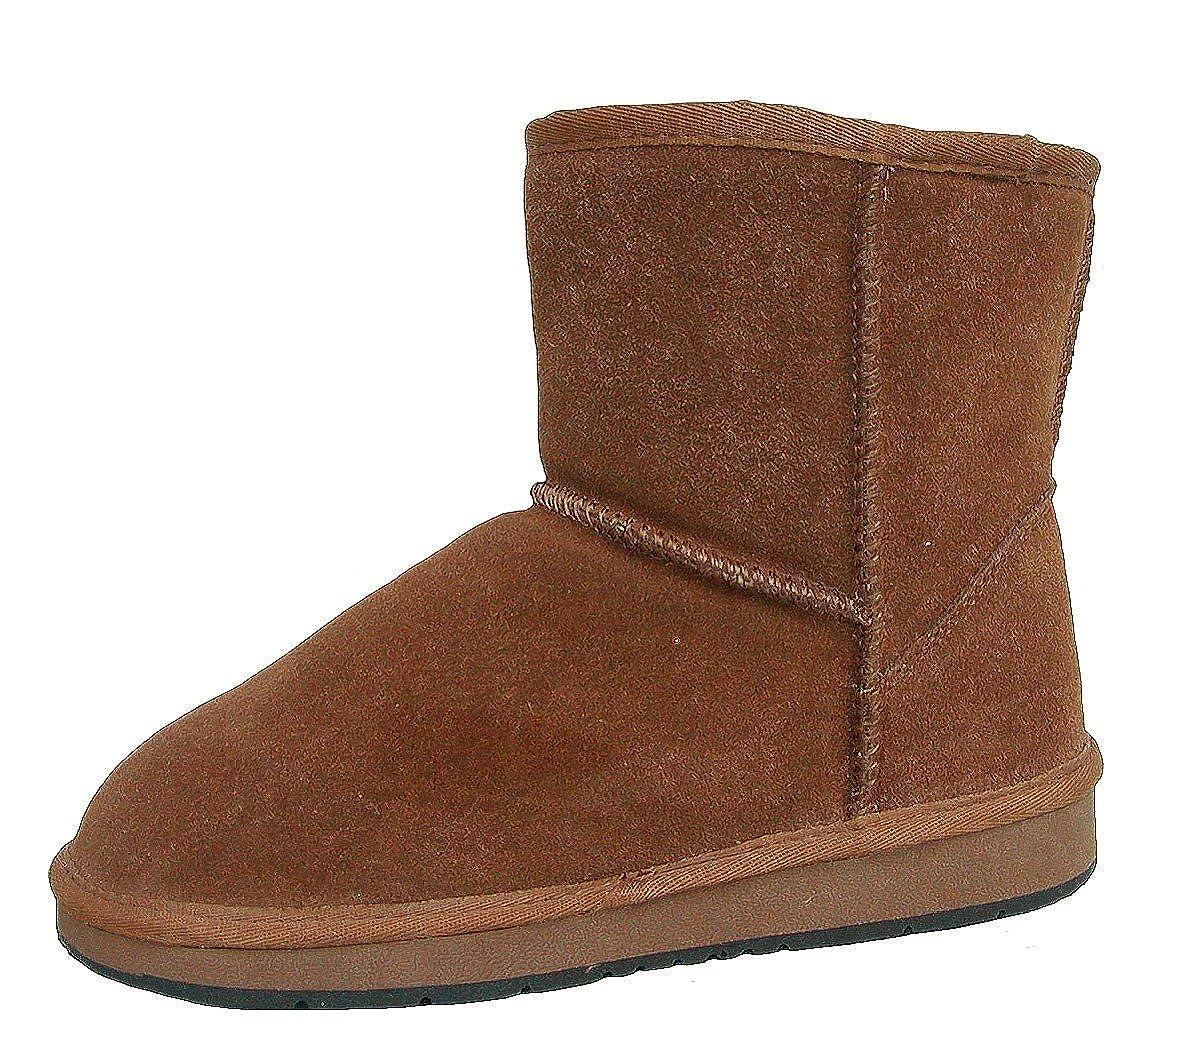 Heitmann Felle Damen Lammfell Leder Trendige Winter Stiefel Camel warme Laufsohle Trendige Leder Profilsohle Lammfell Futter Gr. 36 4493bf